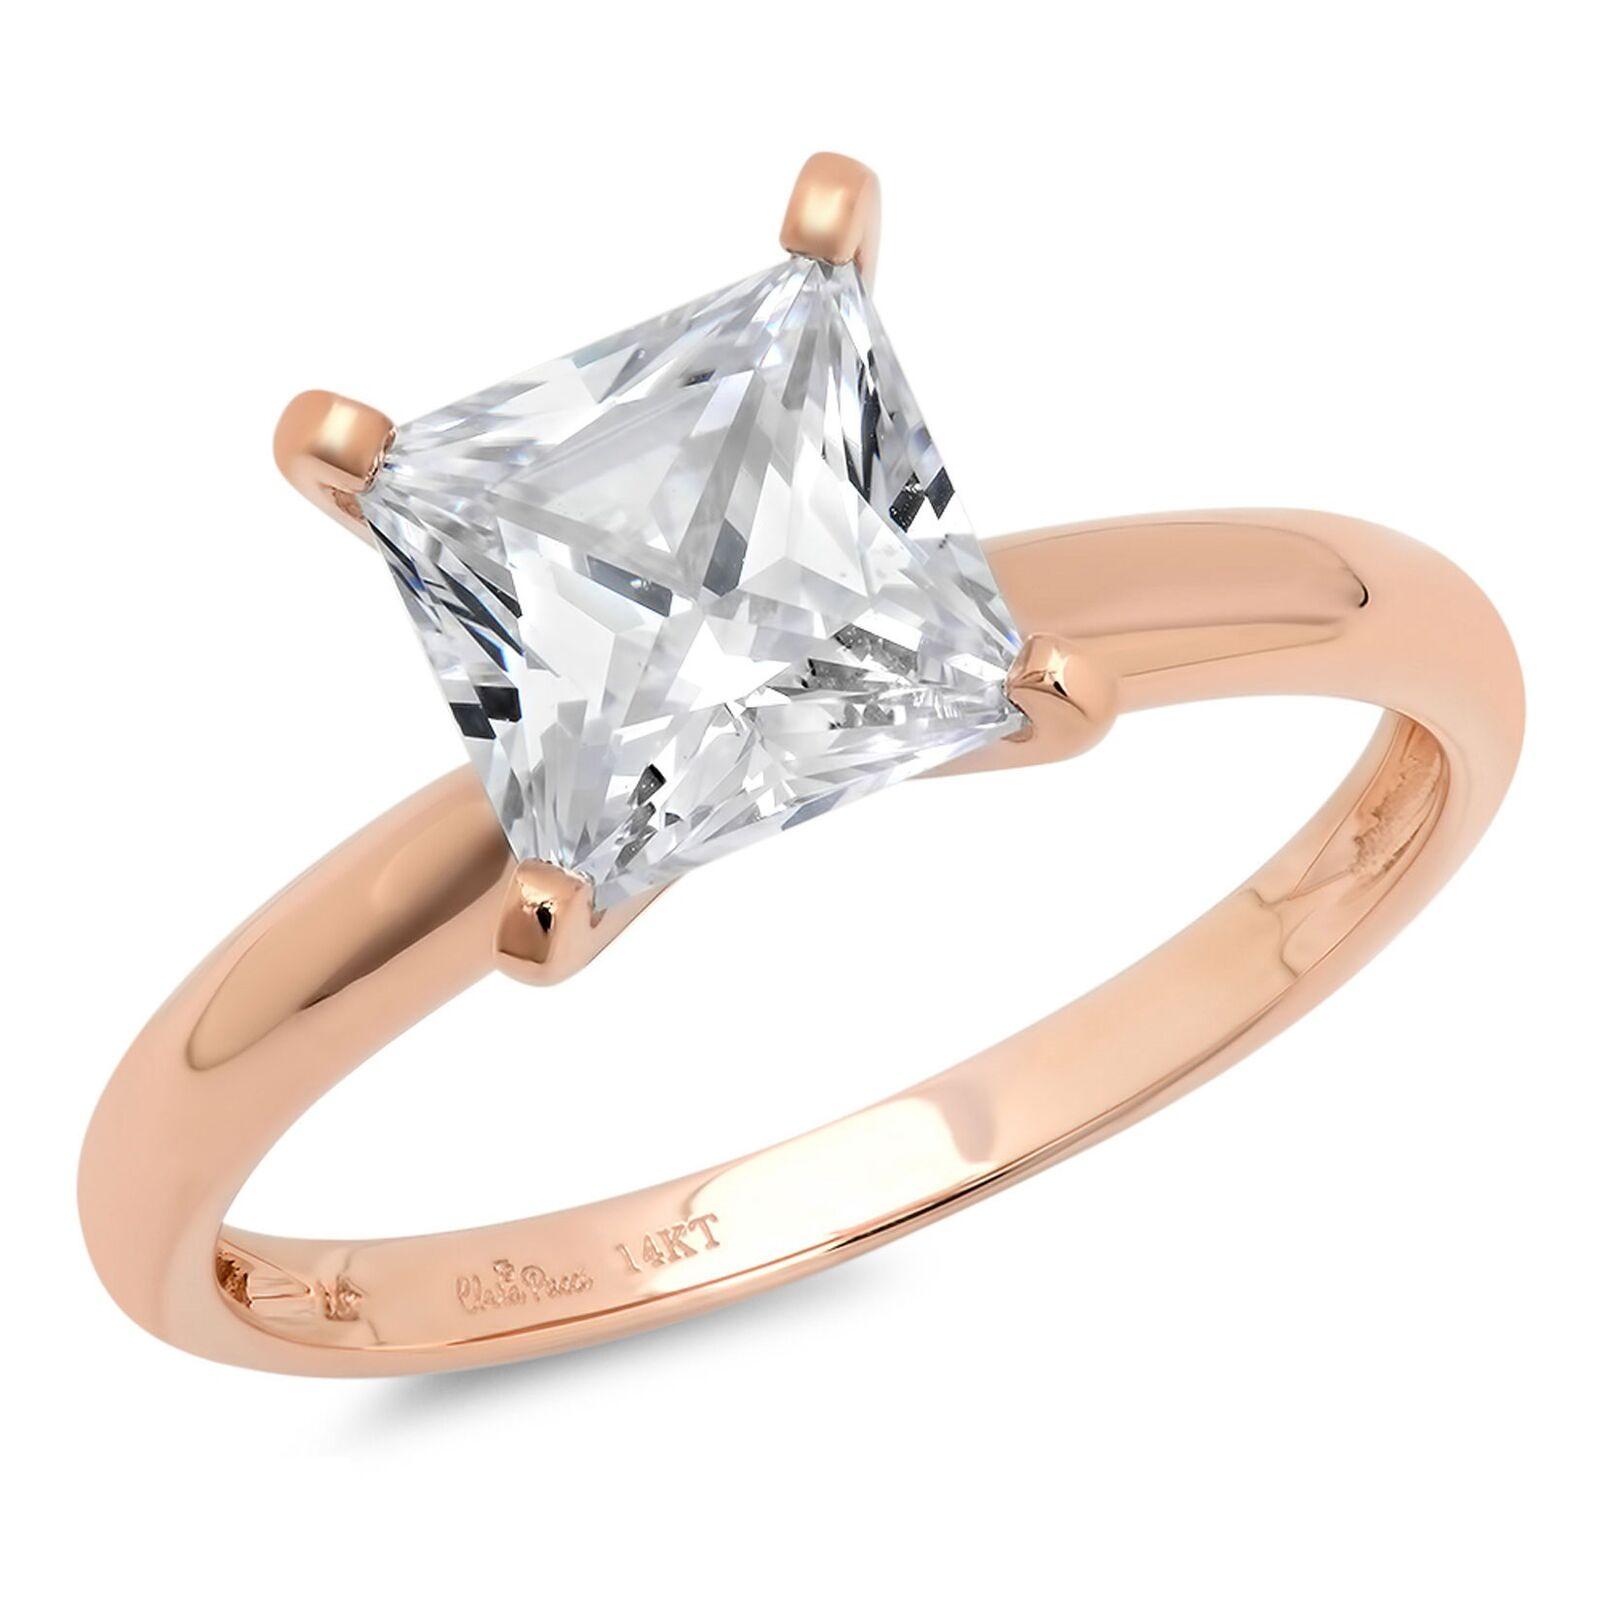 0.6 Princess Cut Wedding Bridal Engagement Anniversary Ring Solid 14k pink gold